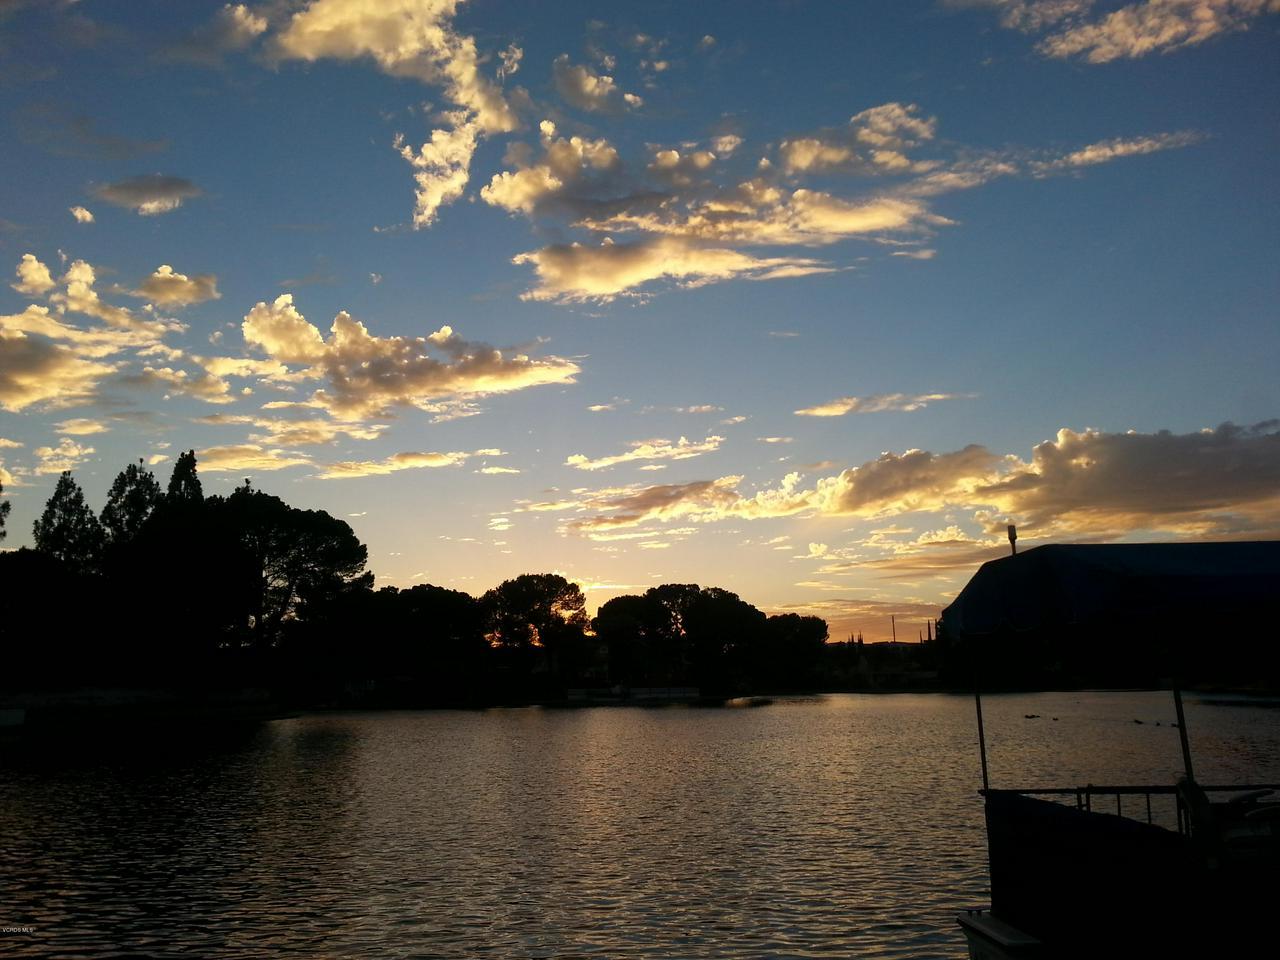 5512 OLD SALT, Agoura Hills, CA 91301 - 20140907_190441 Lake and sky shot